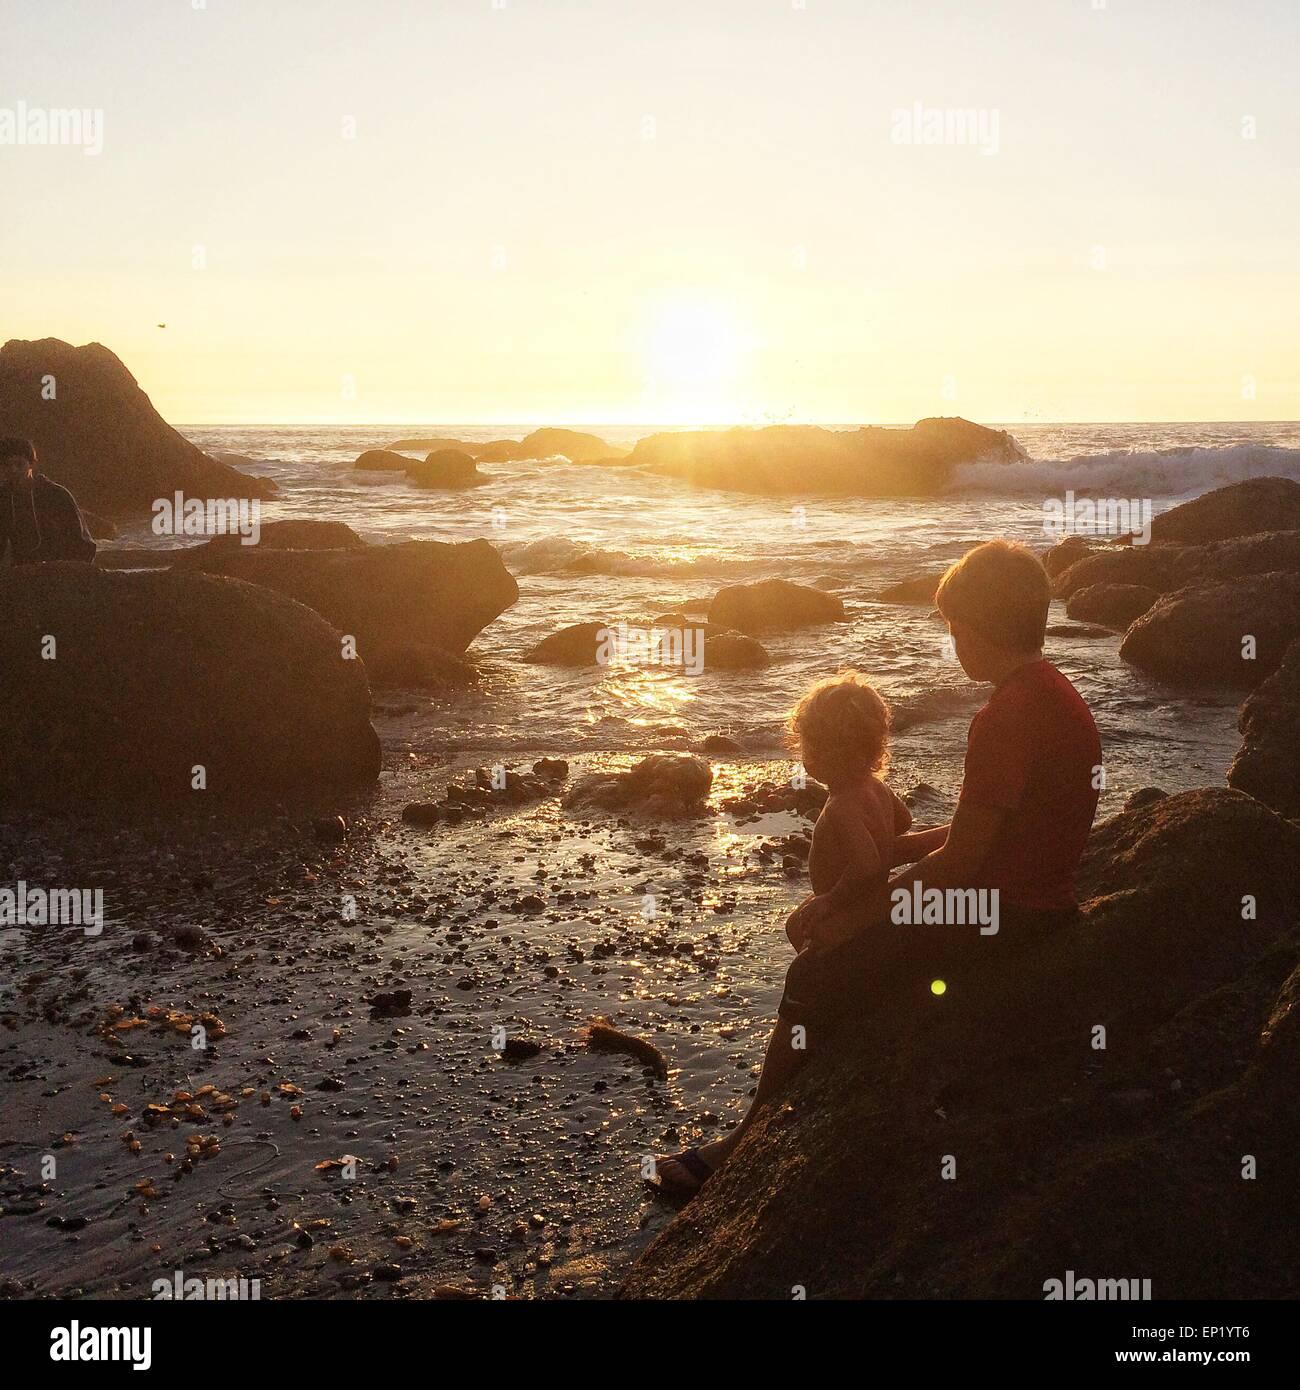 Zwei Jungs sitzen auf den Felsen am Strand bei Sonnenuntergang, Dana Point, Kalifornien, USA Stockbild